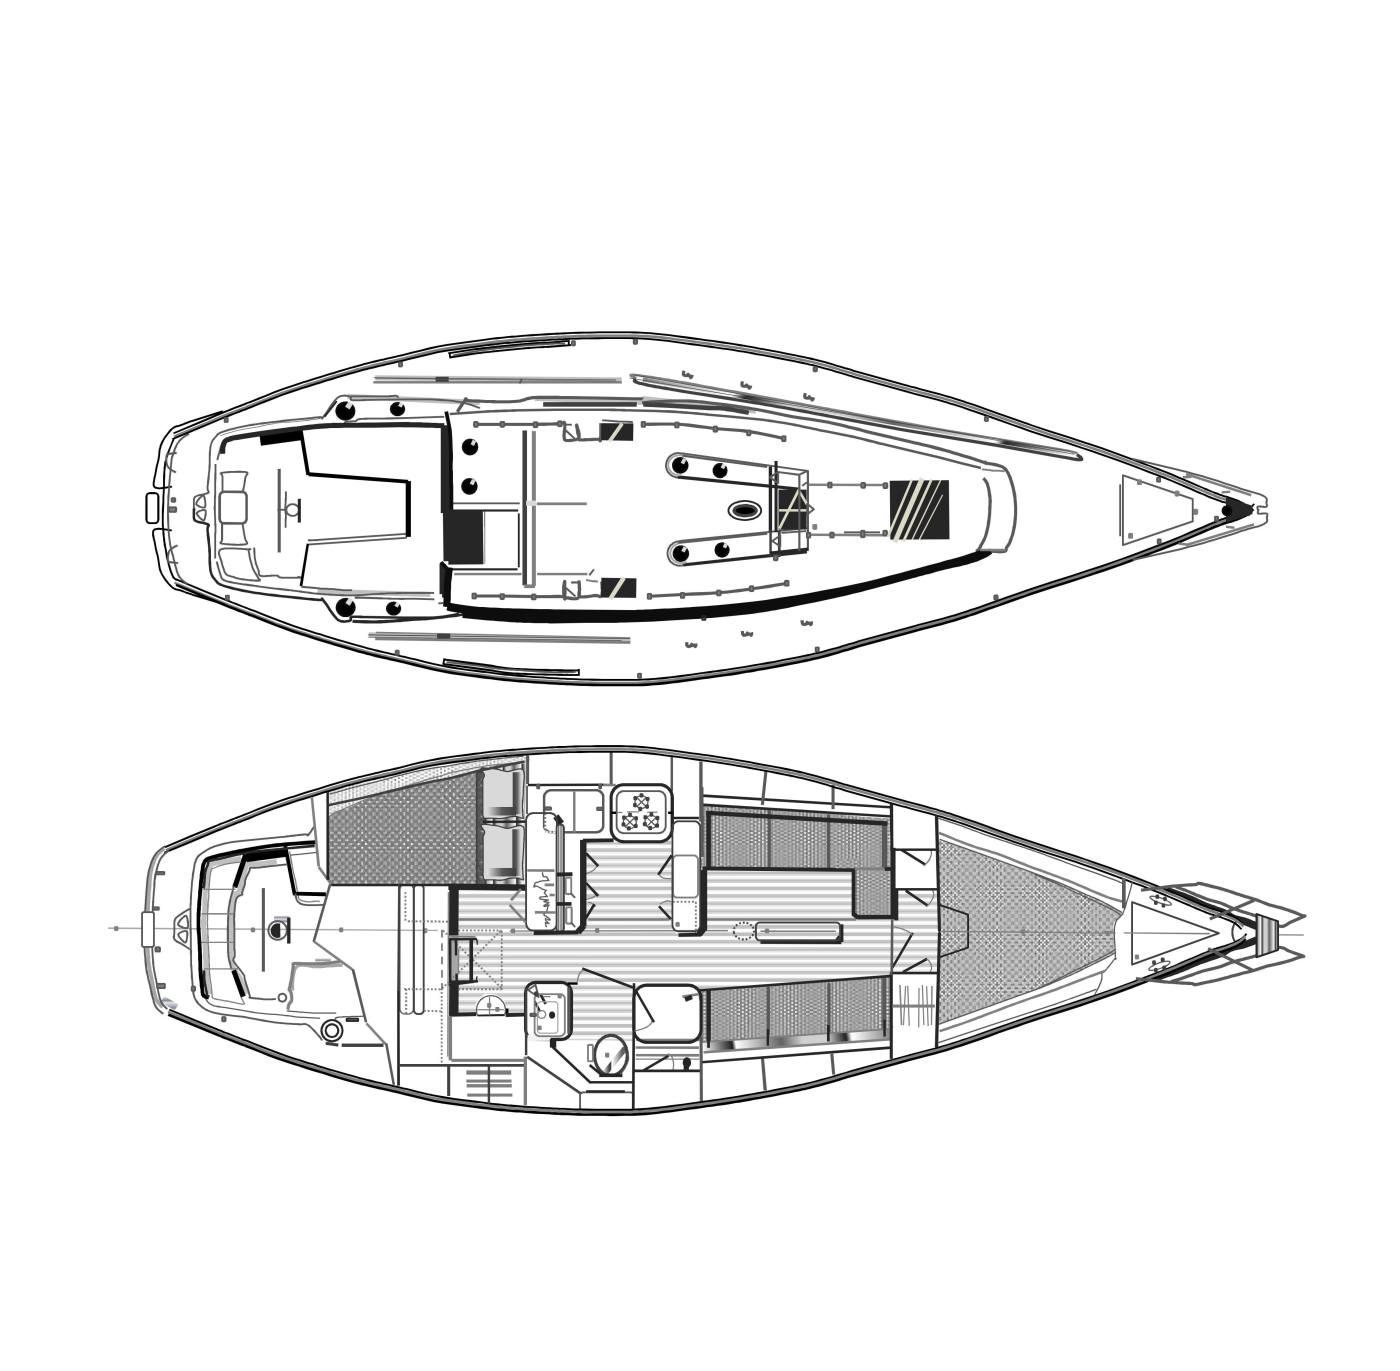 Catalina 38 | the decks